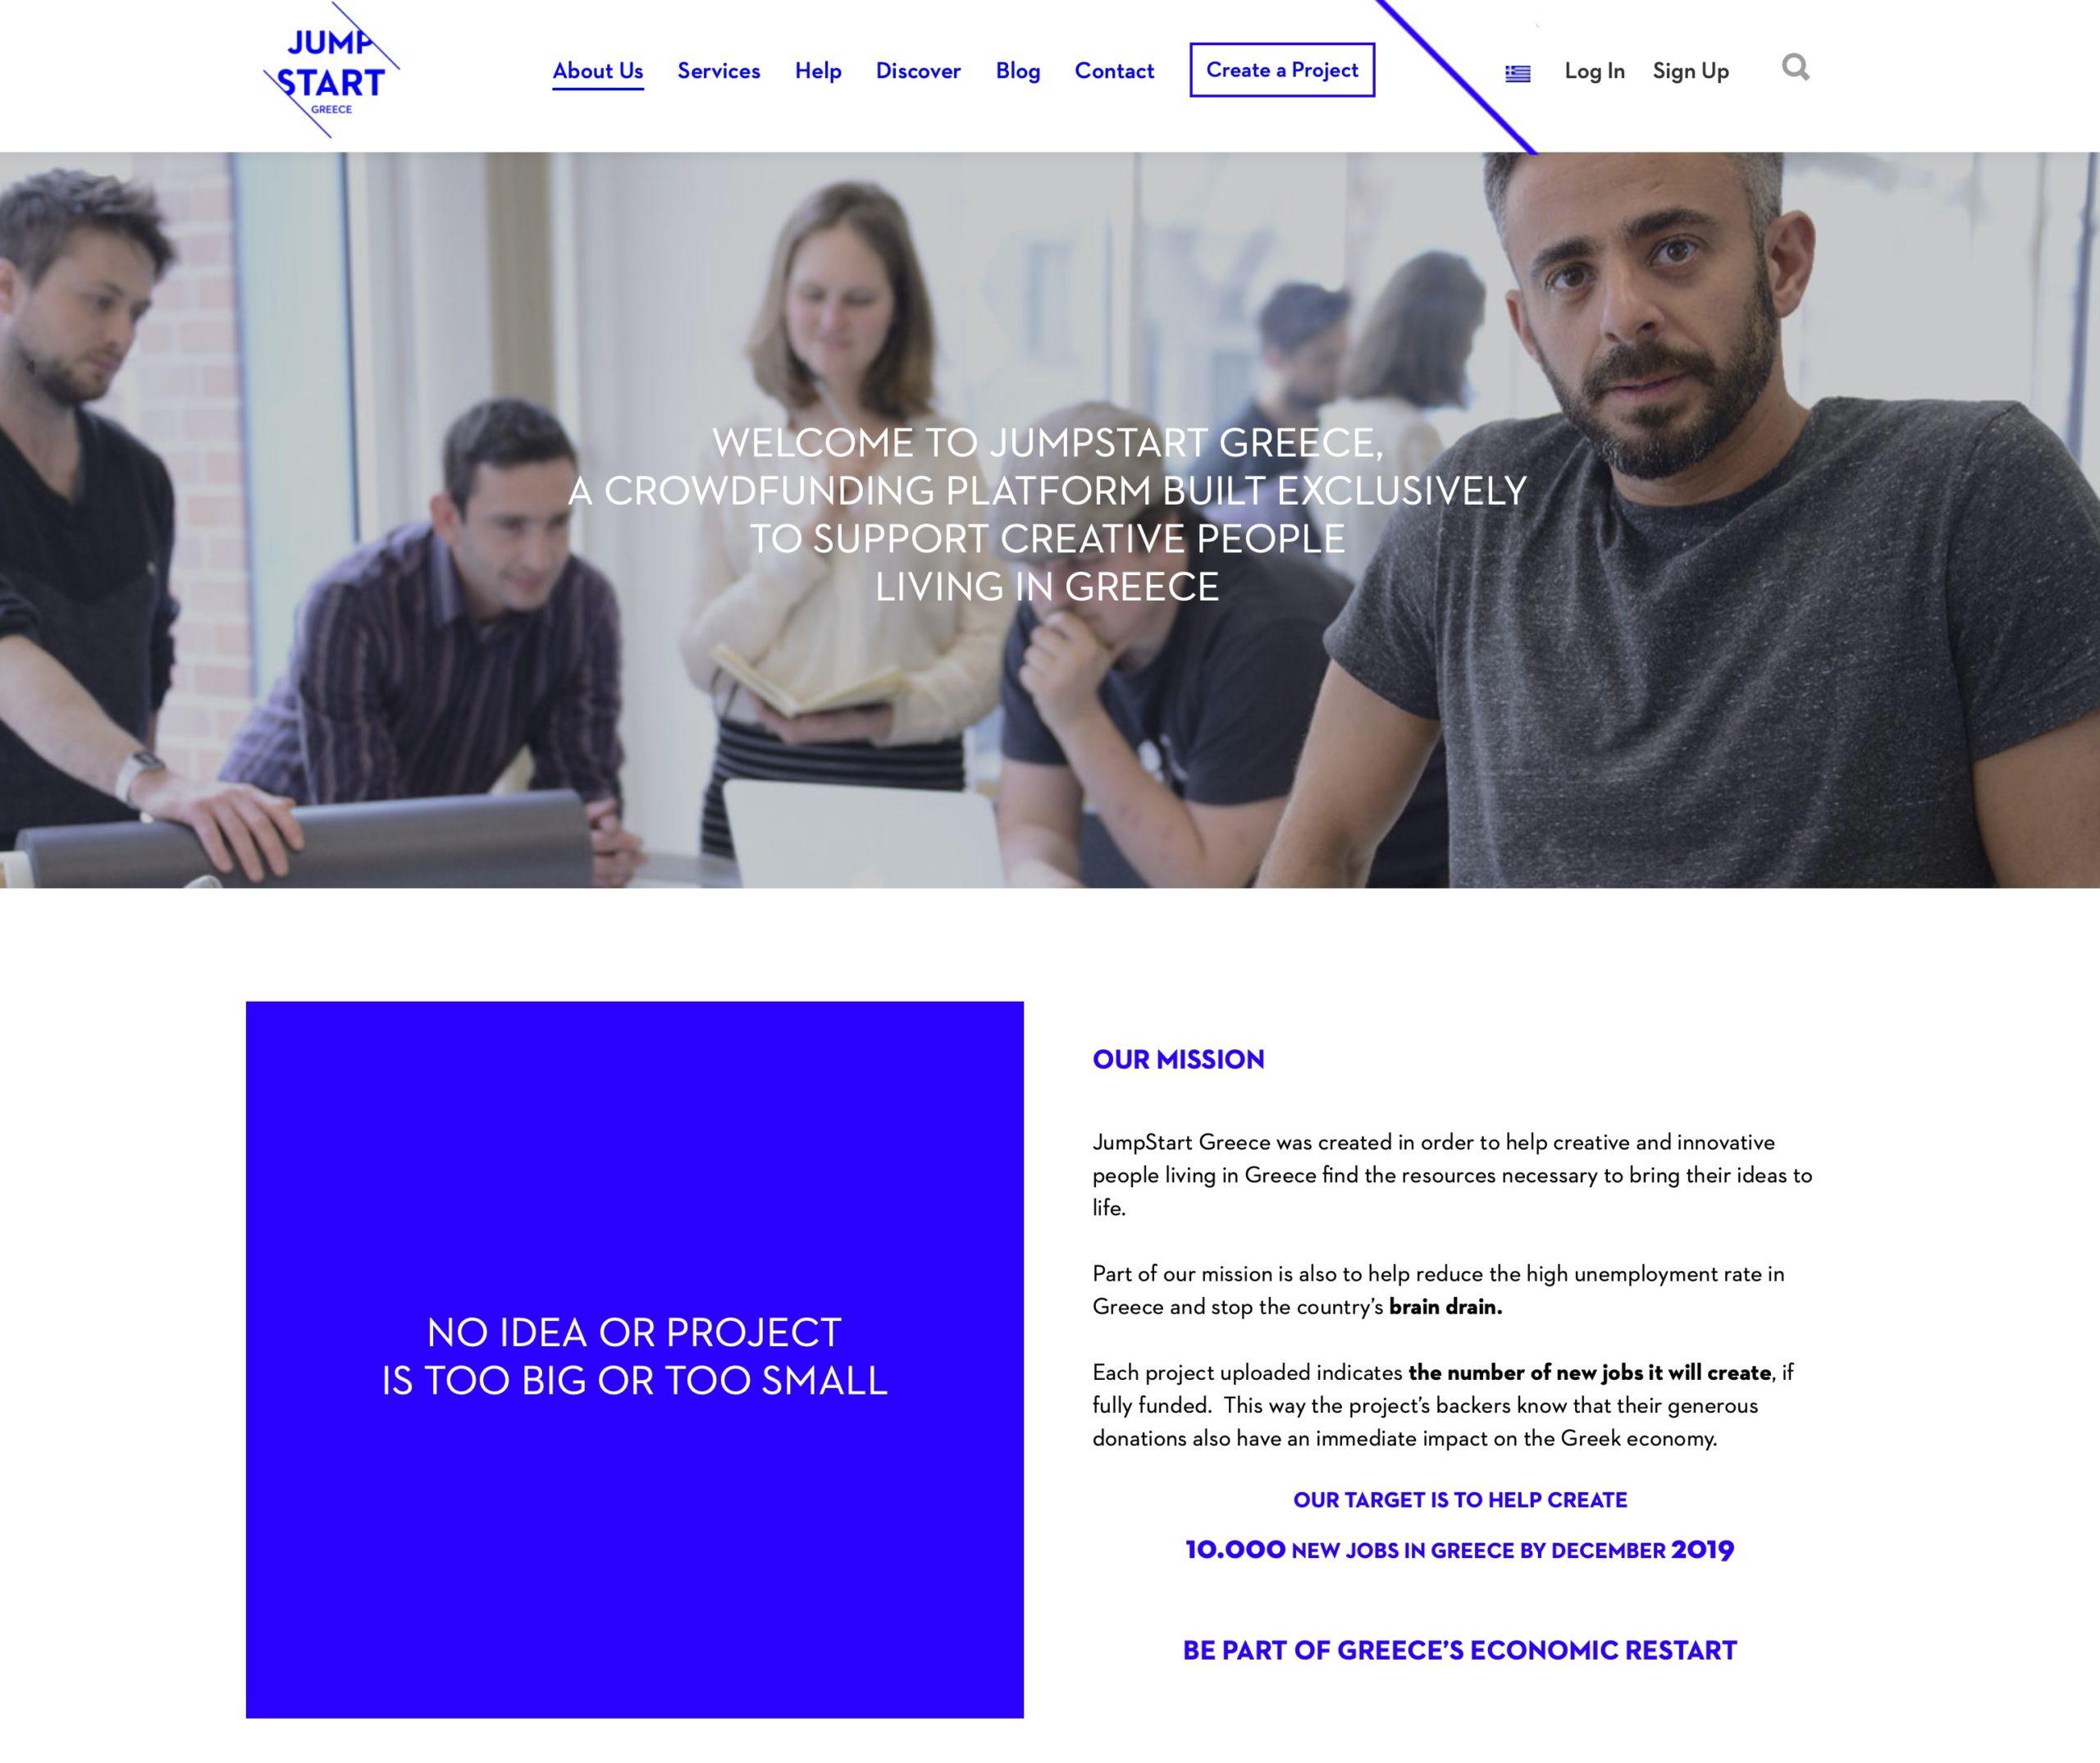 clients-screen